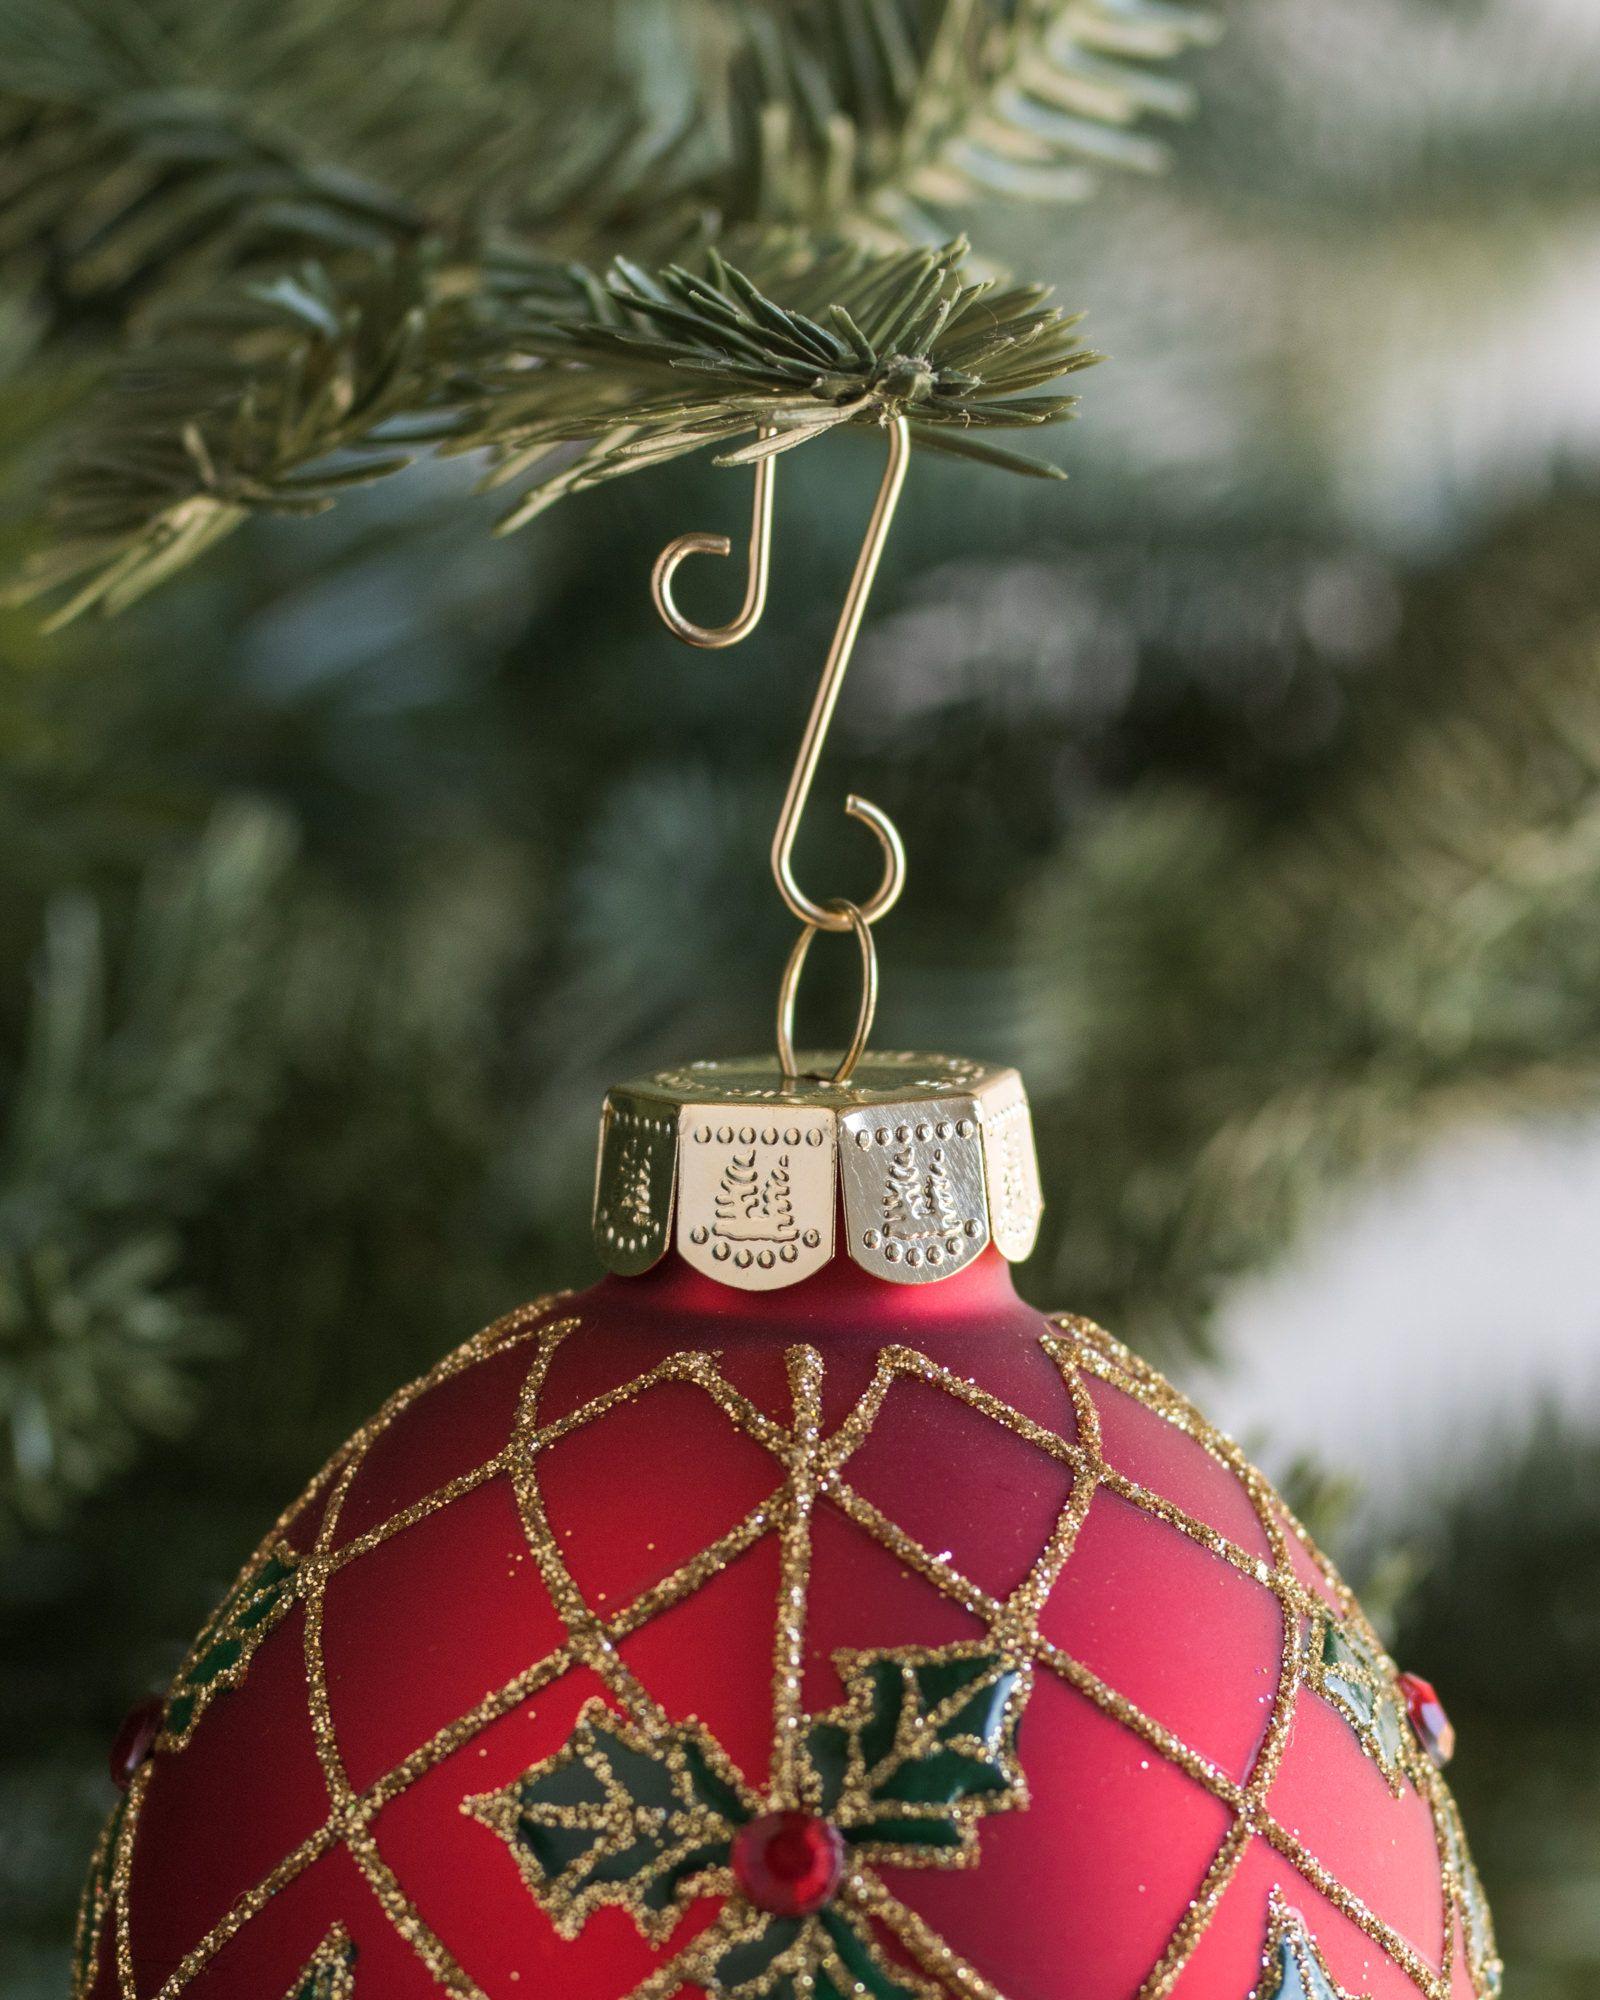 Christmas Ornament Hooks Balsam Hill Christmas Ornament Sets Christmas Ornaments Ornament Hooks